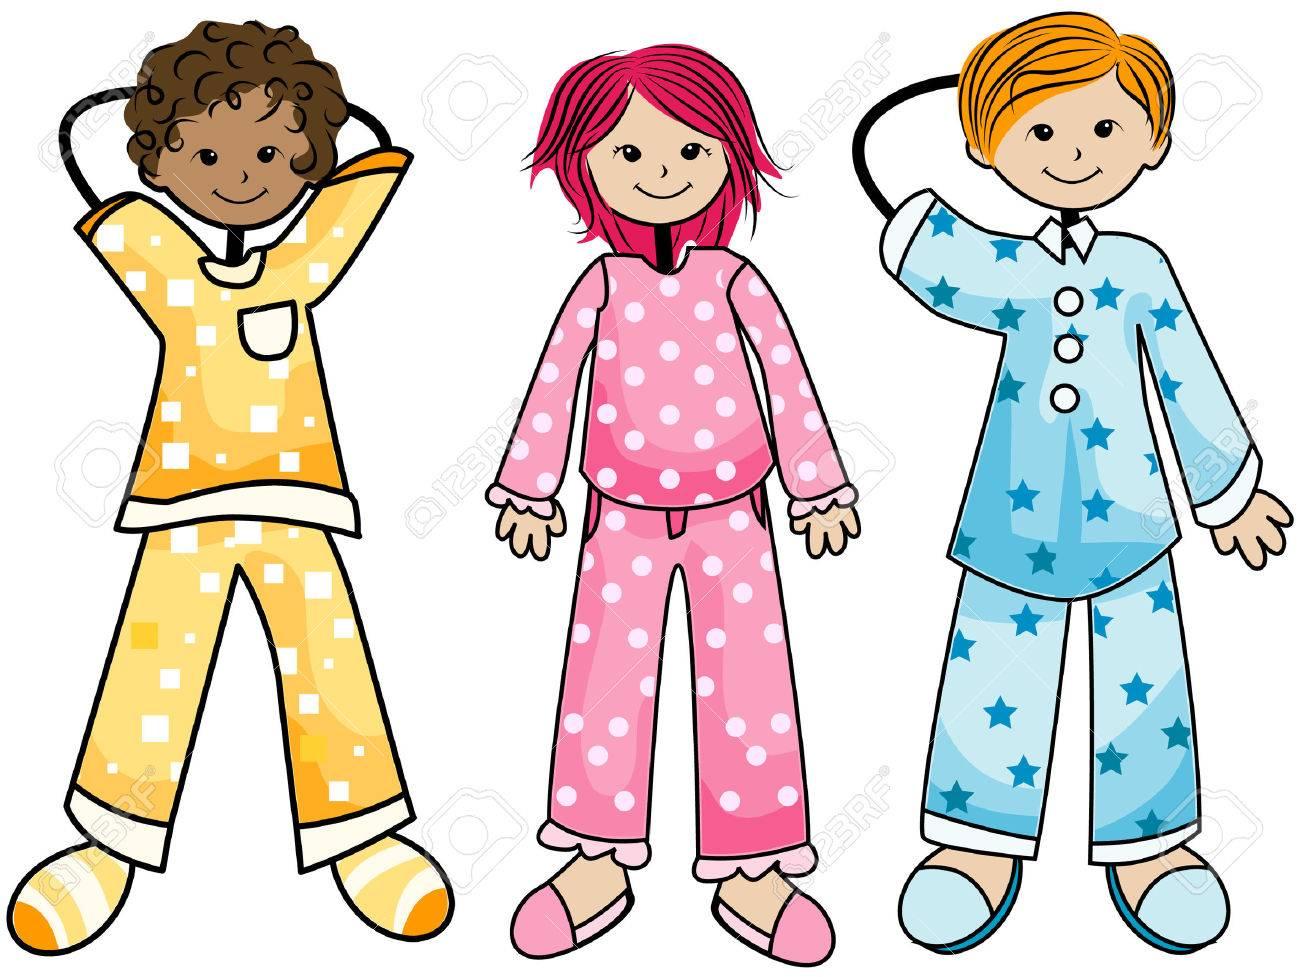 Image result for pajama kids